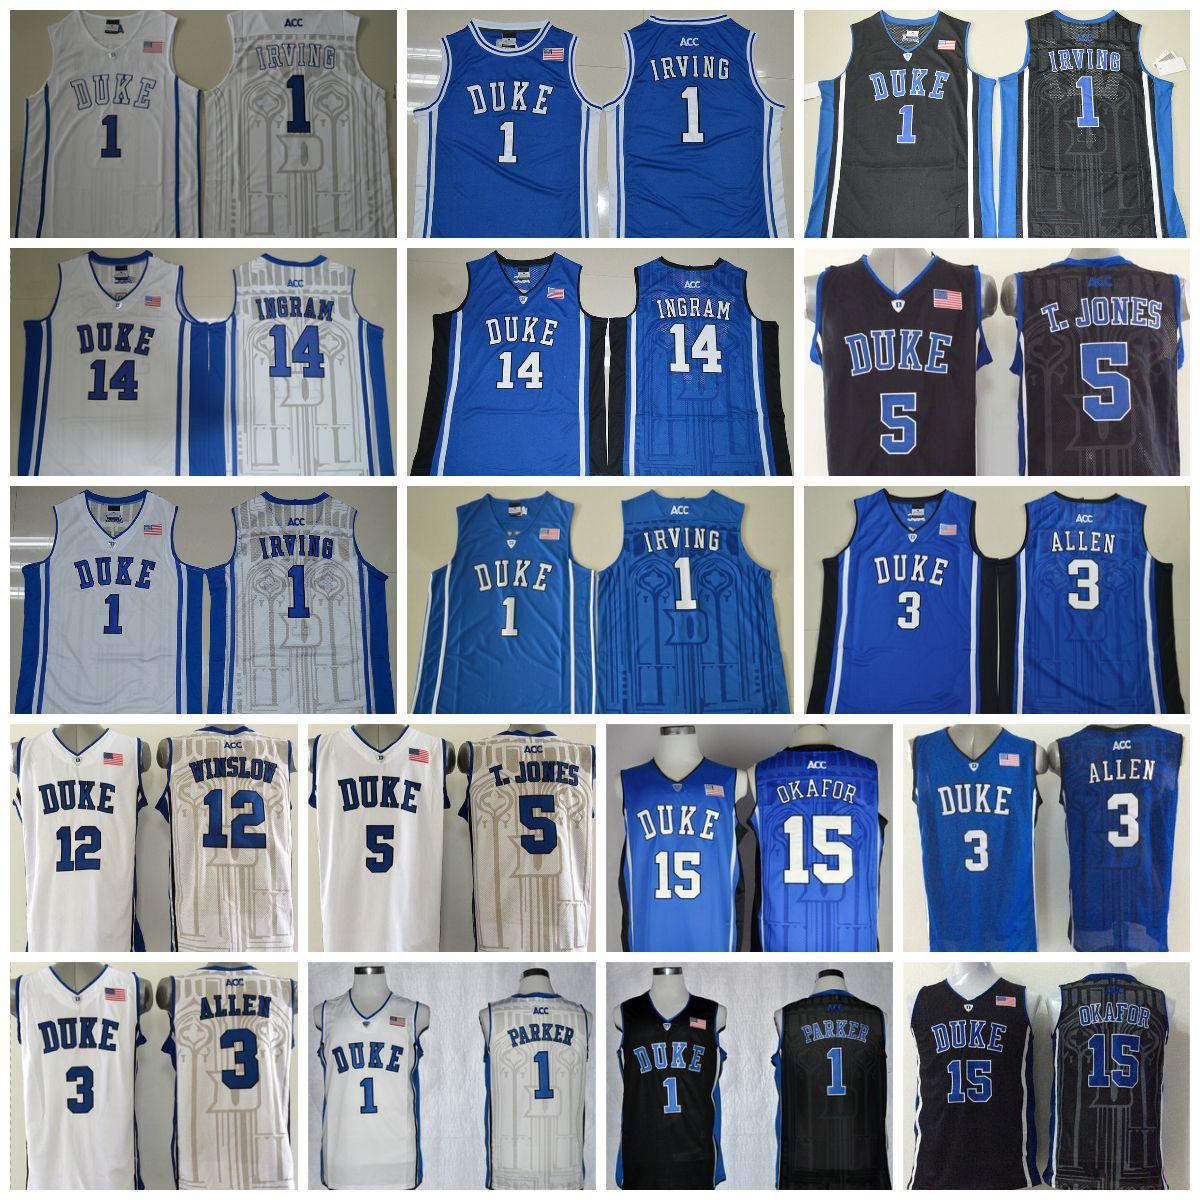 c901585631e 2019 Devils Basketball Jerseys College 3 Grayson Allen 1 Kyrie Irving 1  Jabari Parker 3 Grayson Allen 5 Tyus Jones 12 Justise Winslow Duke Blue From  ...